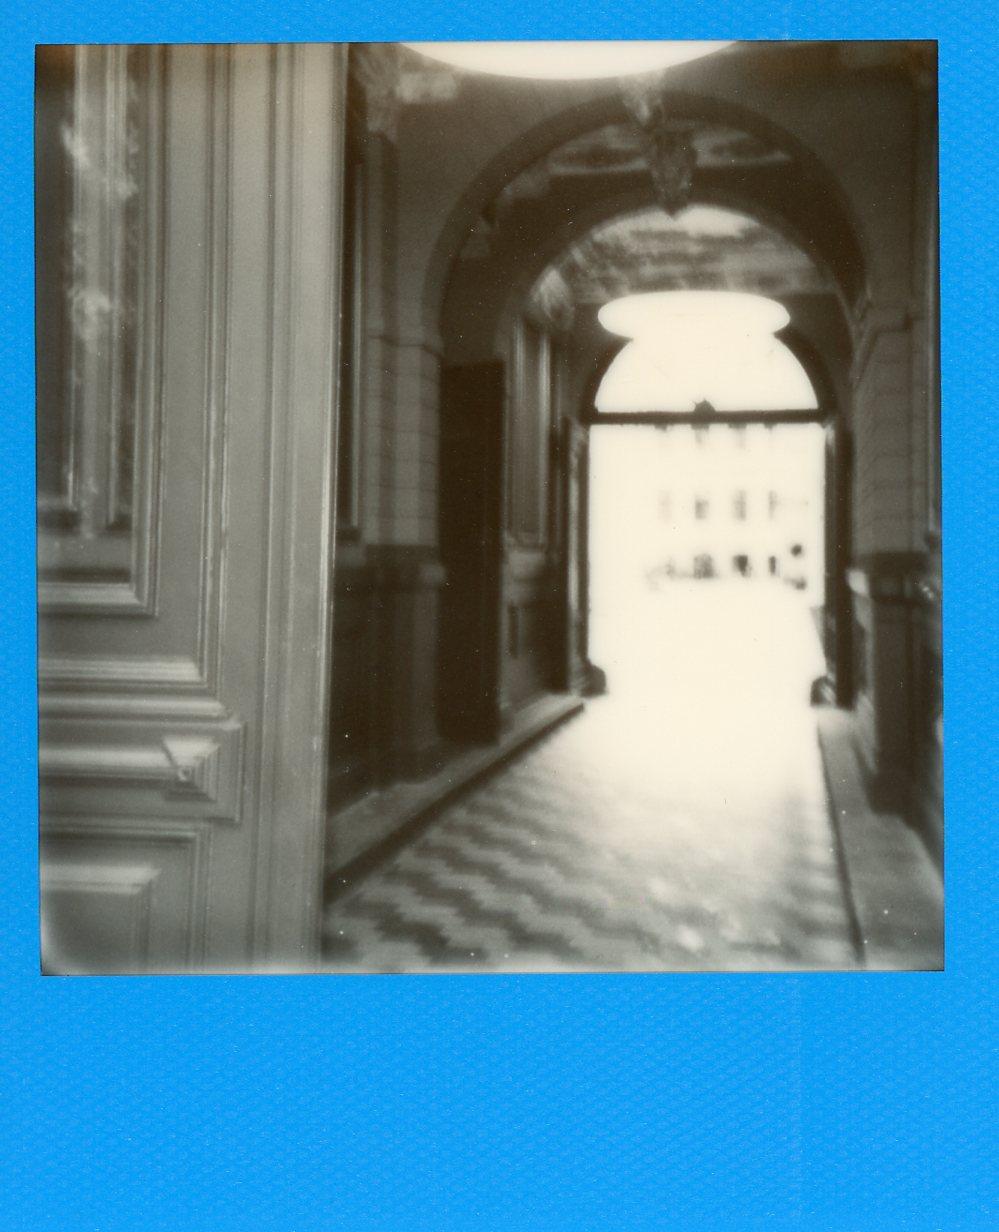 Berlin_Polaroid009.jpg